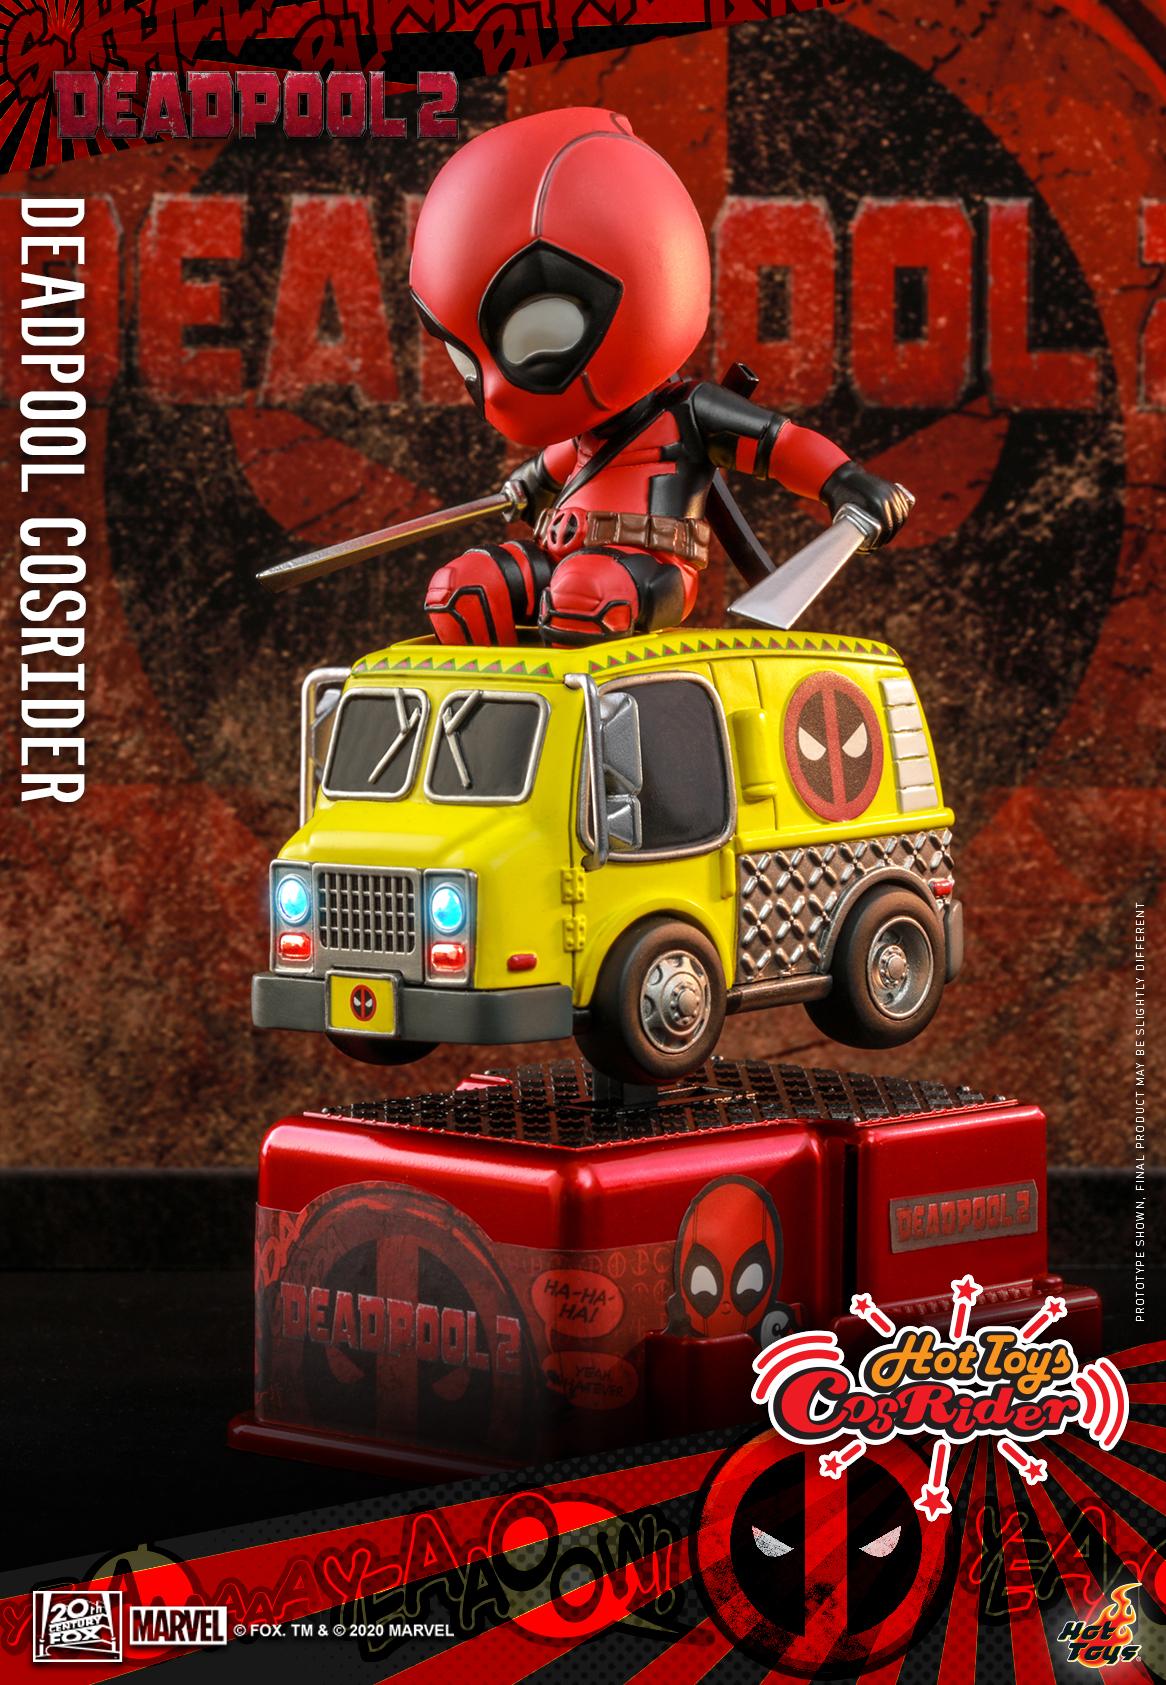 Hot Toys - Deadpool 2 - Deadpool CosRider_PR1